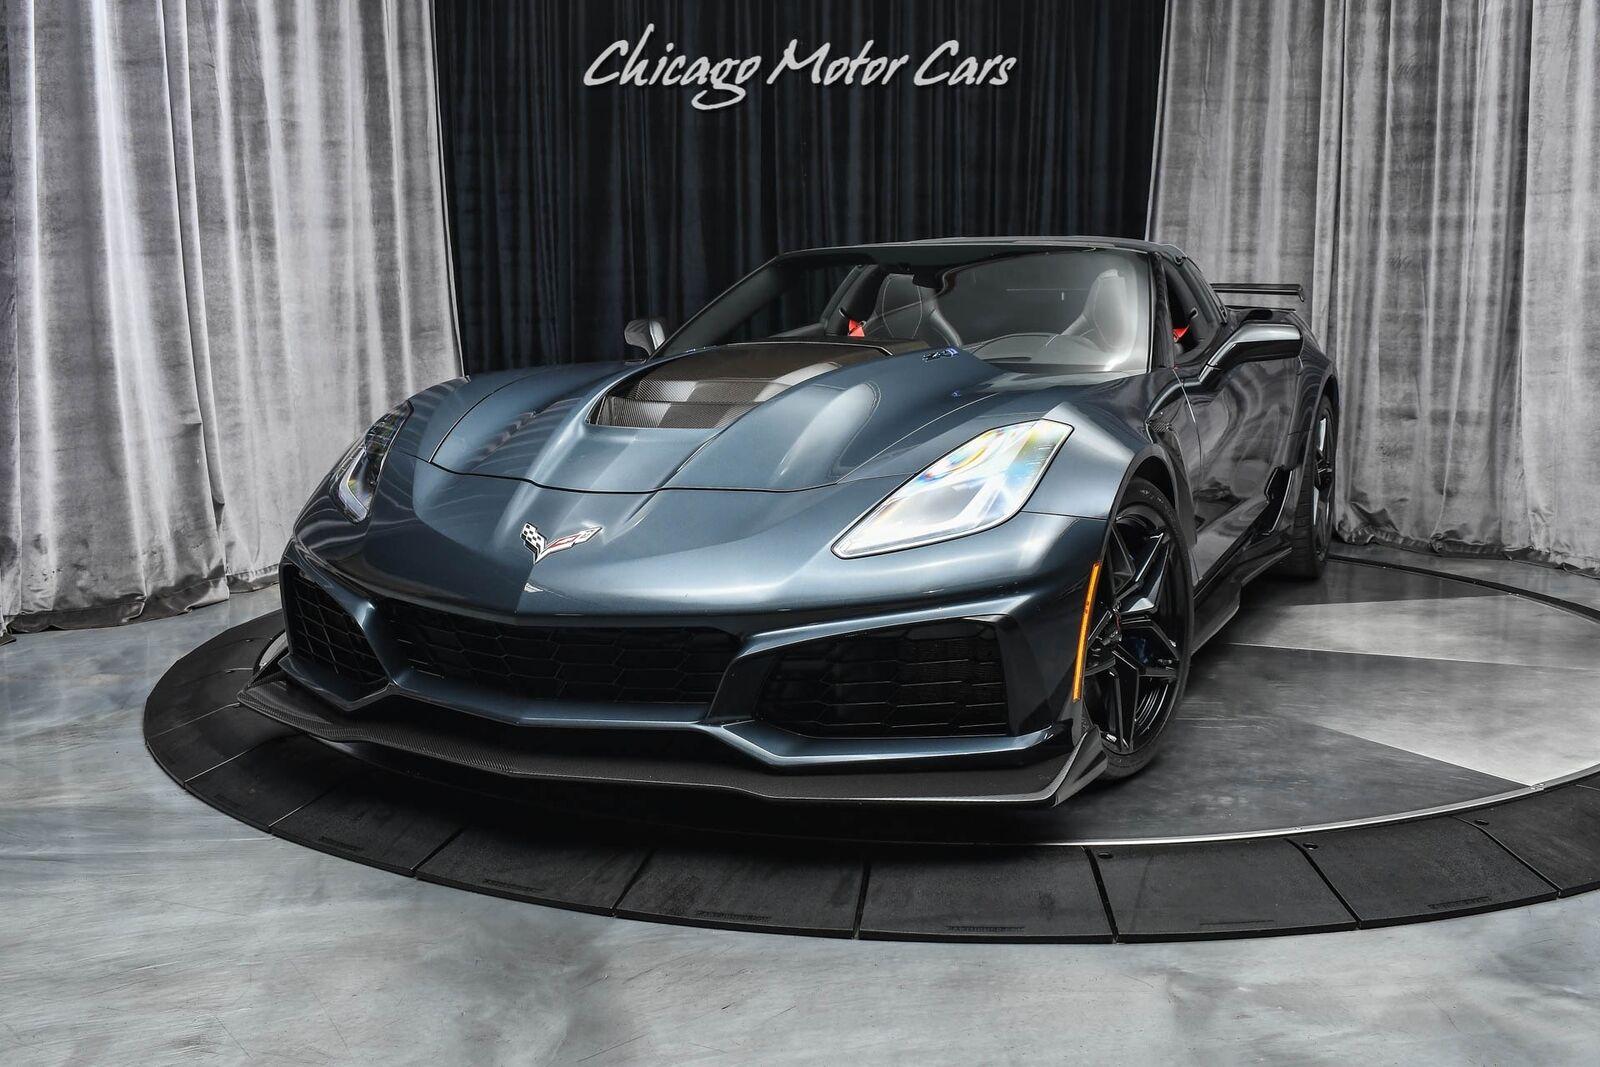 2019 Gray Chevrolet Corvette ZR1  | C7 Corvette Photo 2